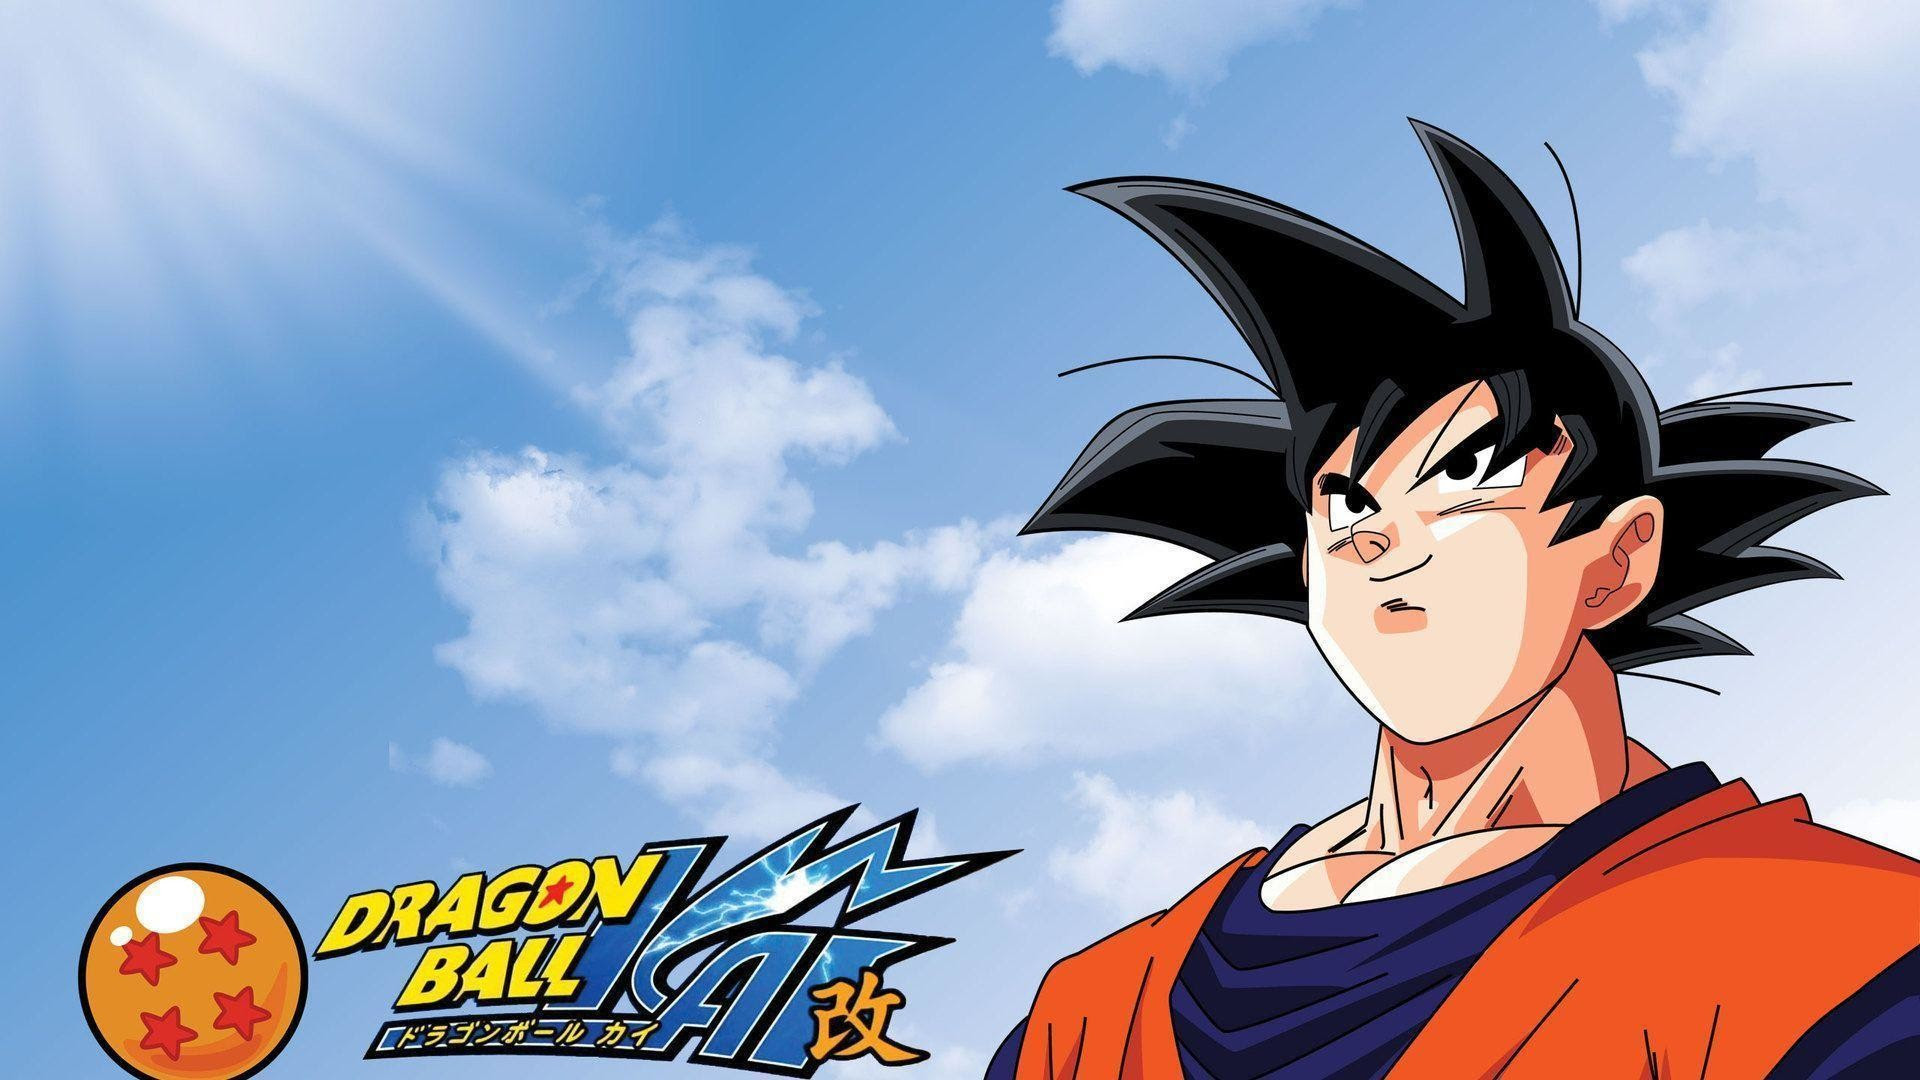 Goku Dragon Ball Z Supreme Wallpaper Gambarku